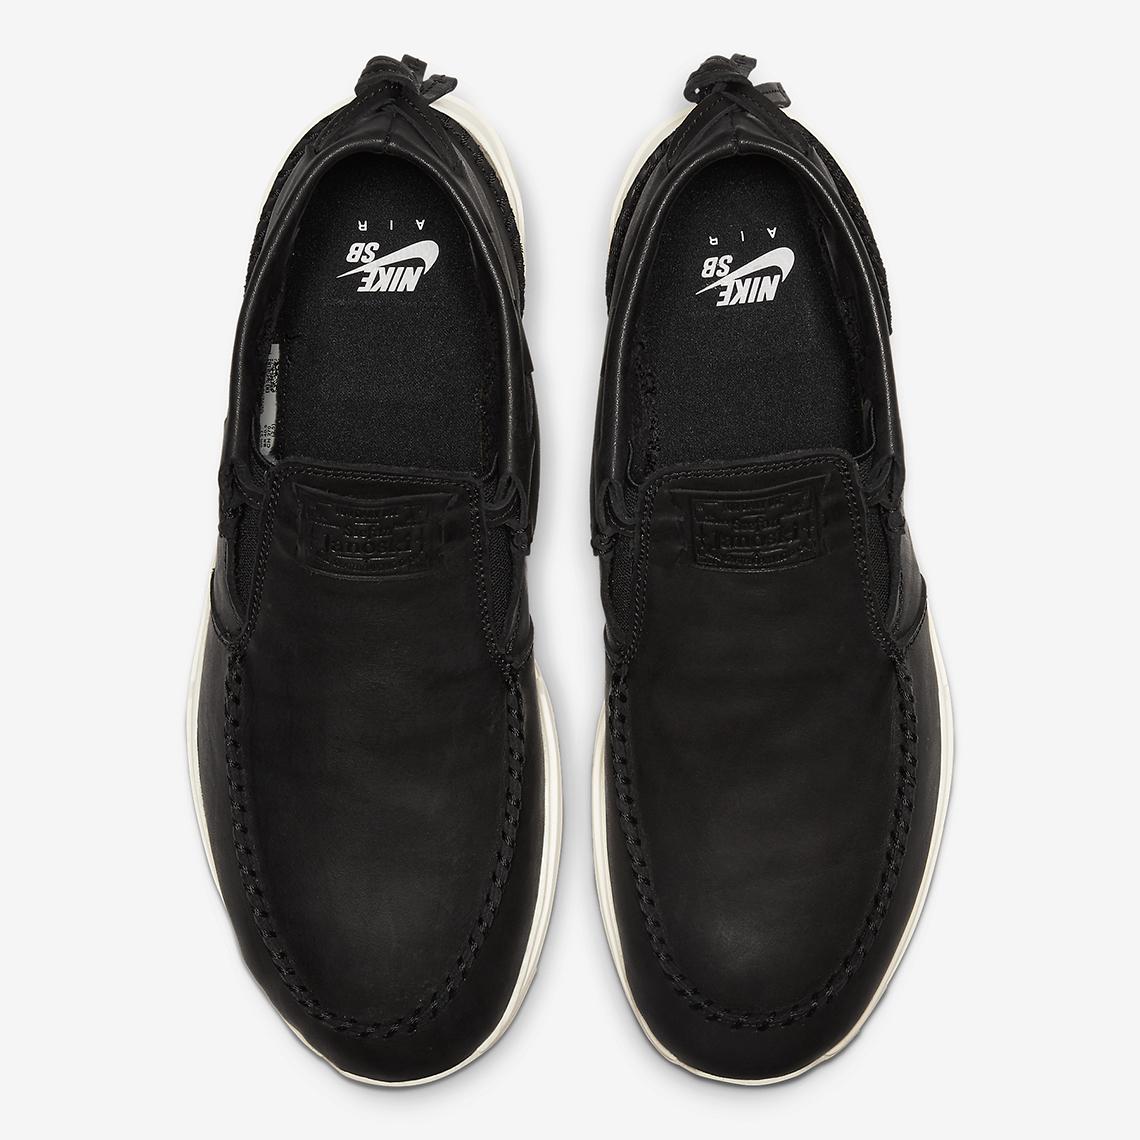 Nike SB Air Max Stefan Janoski 2 Moc (Black)